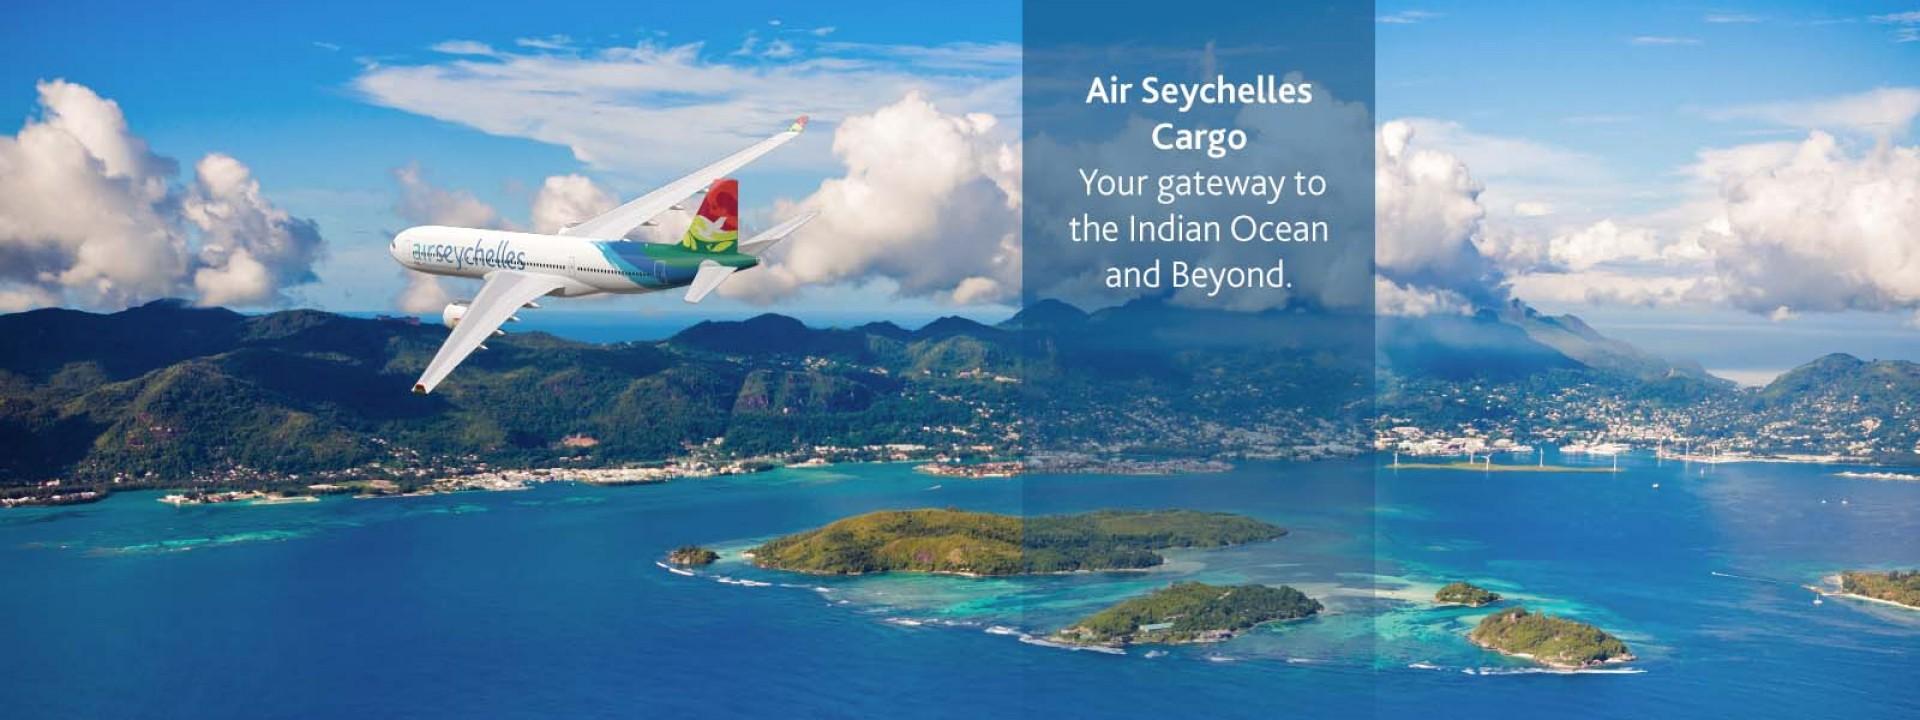 Air Seychelles Cargo